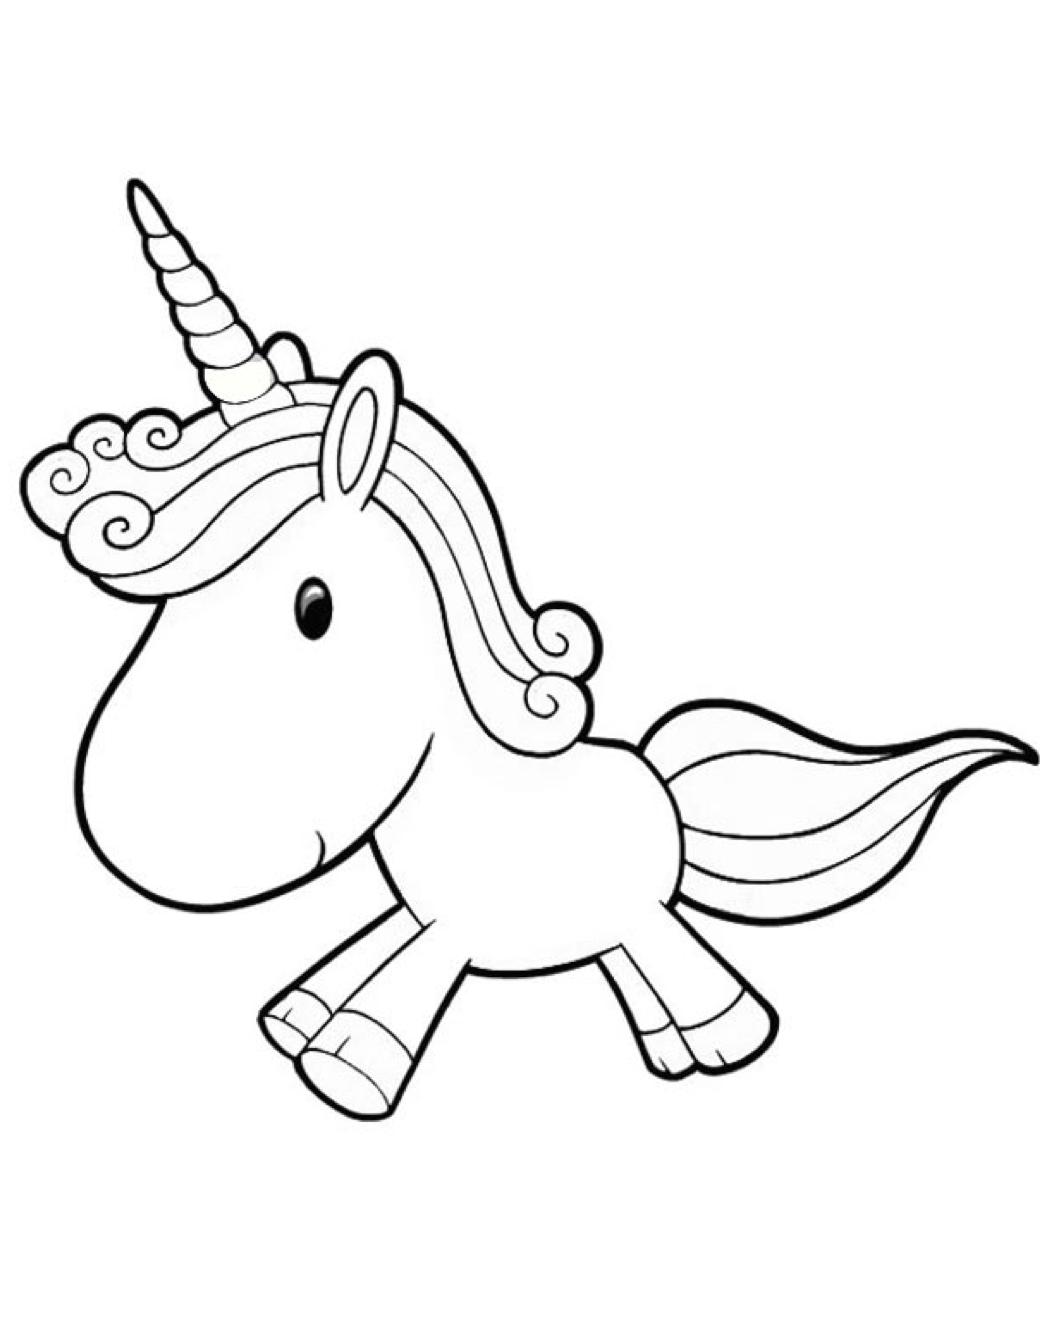 Cartoon Unicorn Coloring Page Coloring Book